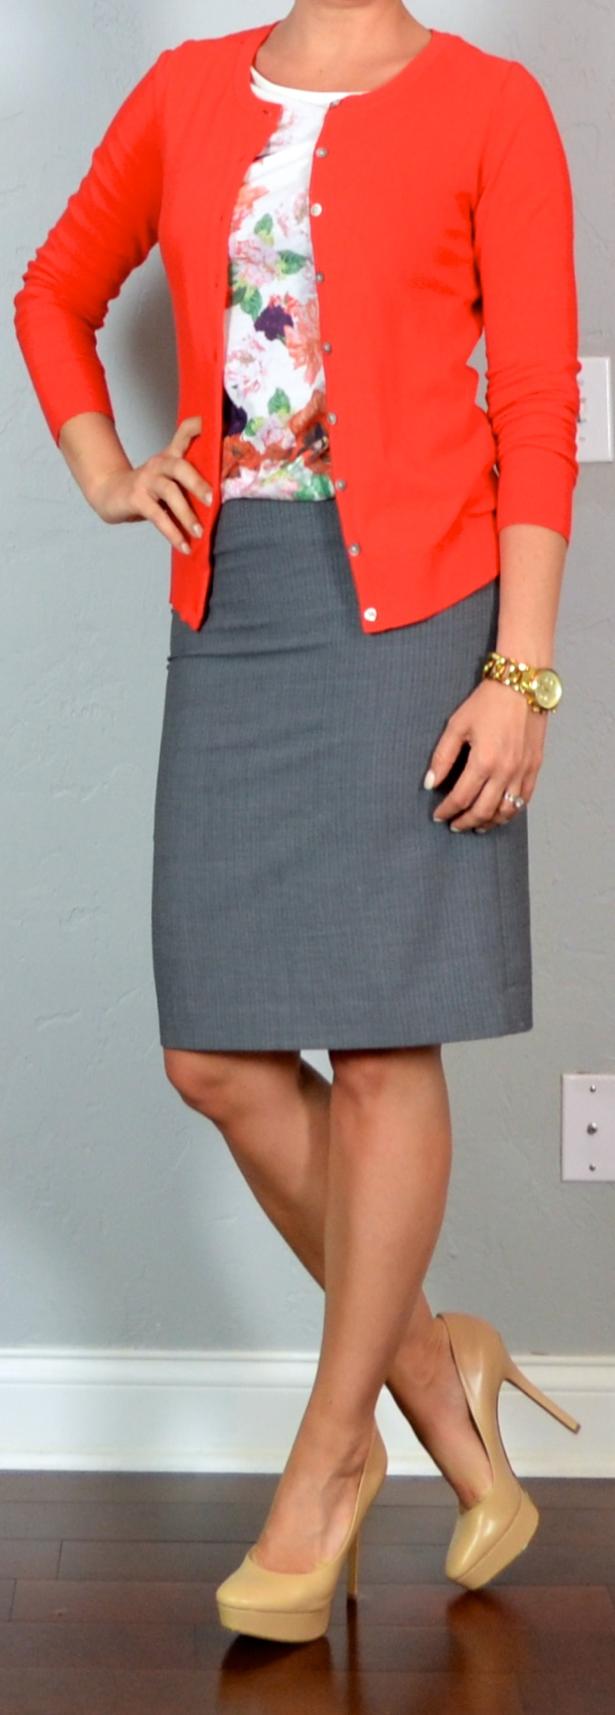 Cardigan And Skirt 69